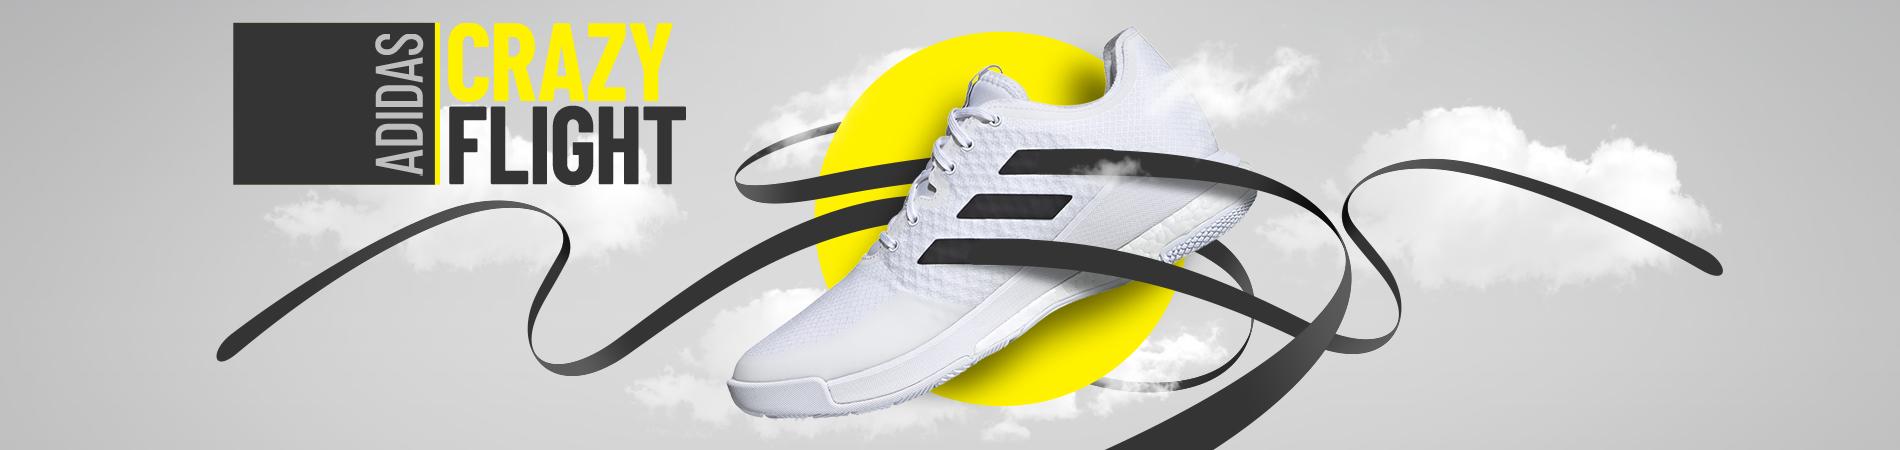 Adidas Crazyflight_1900x450